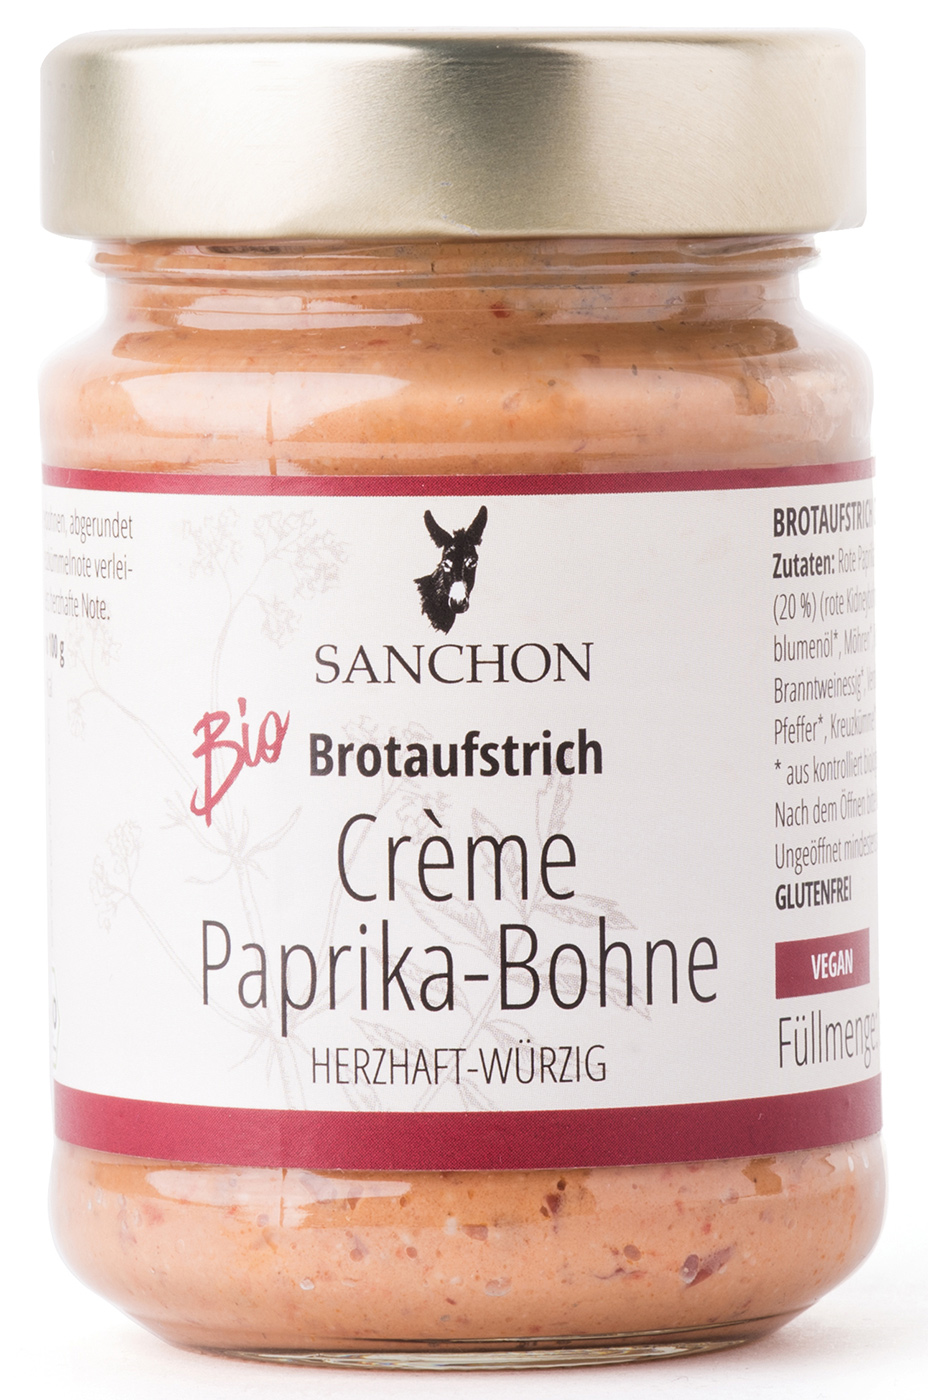 Bio Brotaufstrich Crème Paprika-Bohne, 190 g